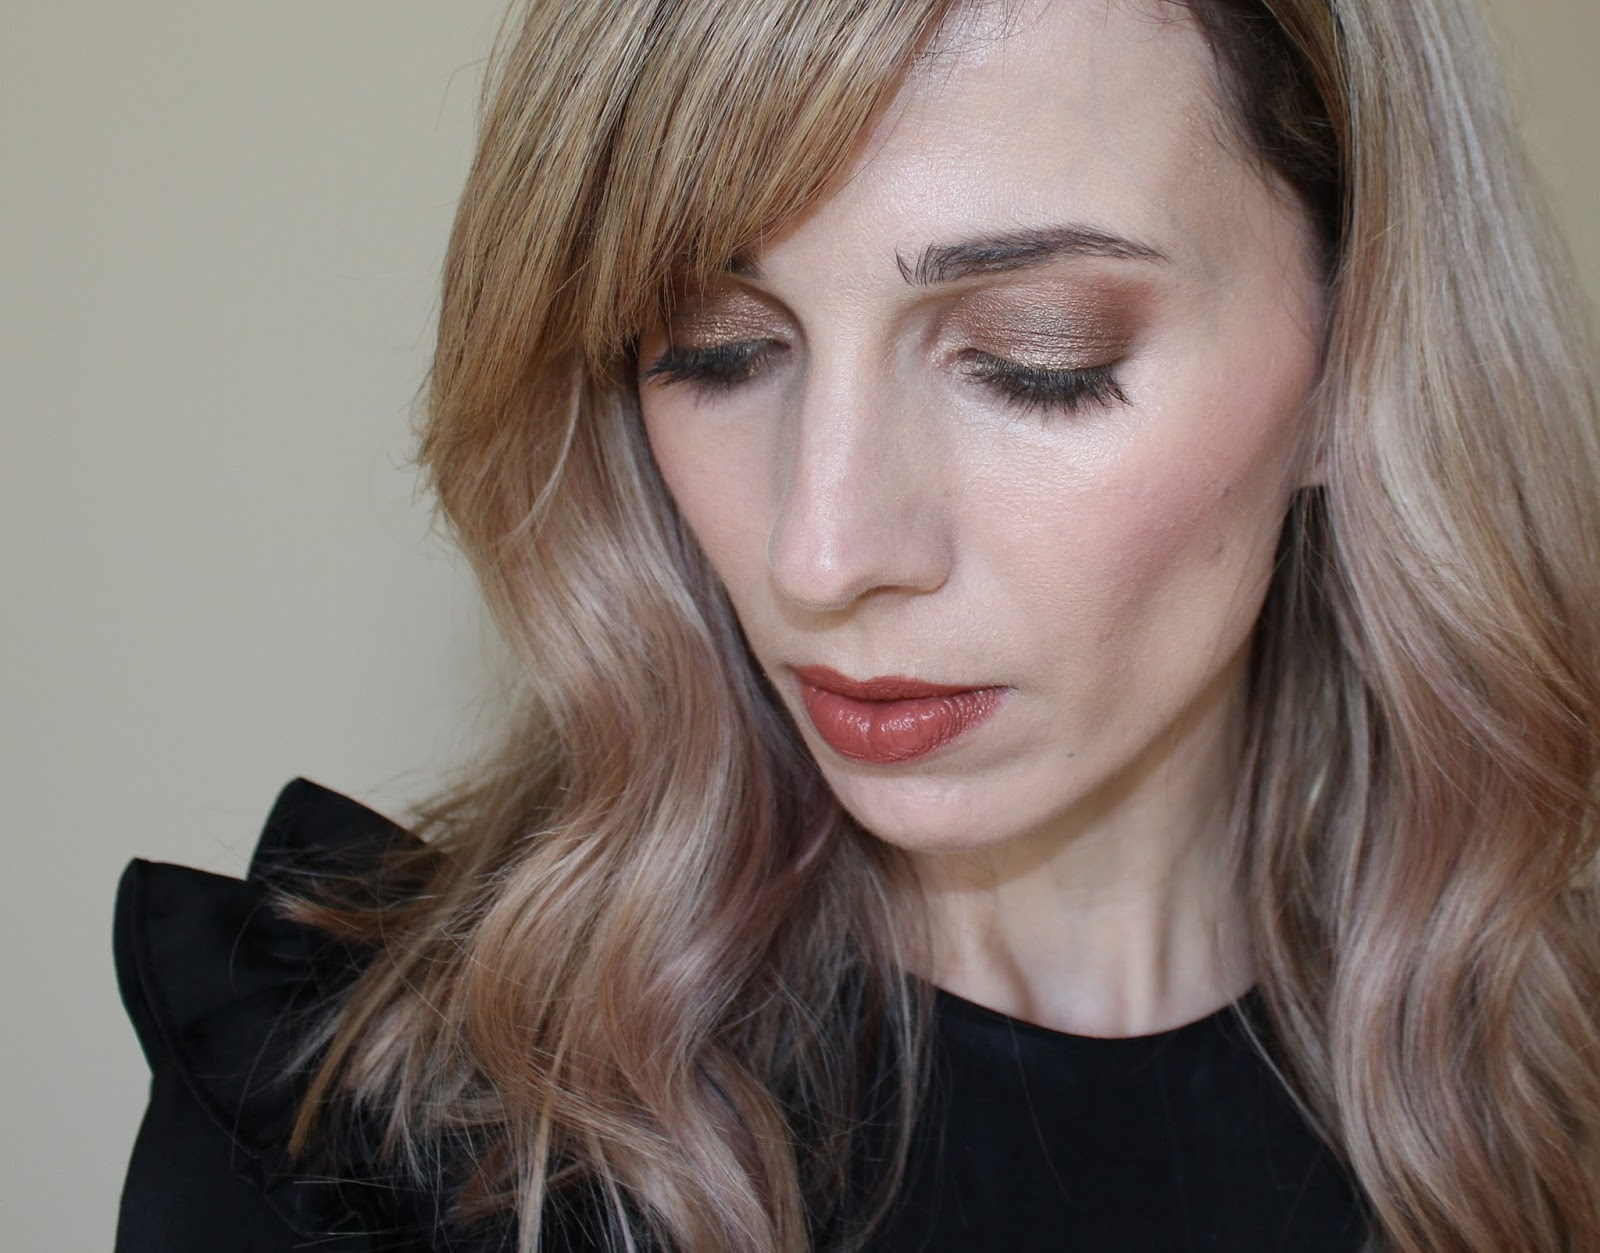 Emma Stone Oscars Inspired Makeup Look - 5